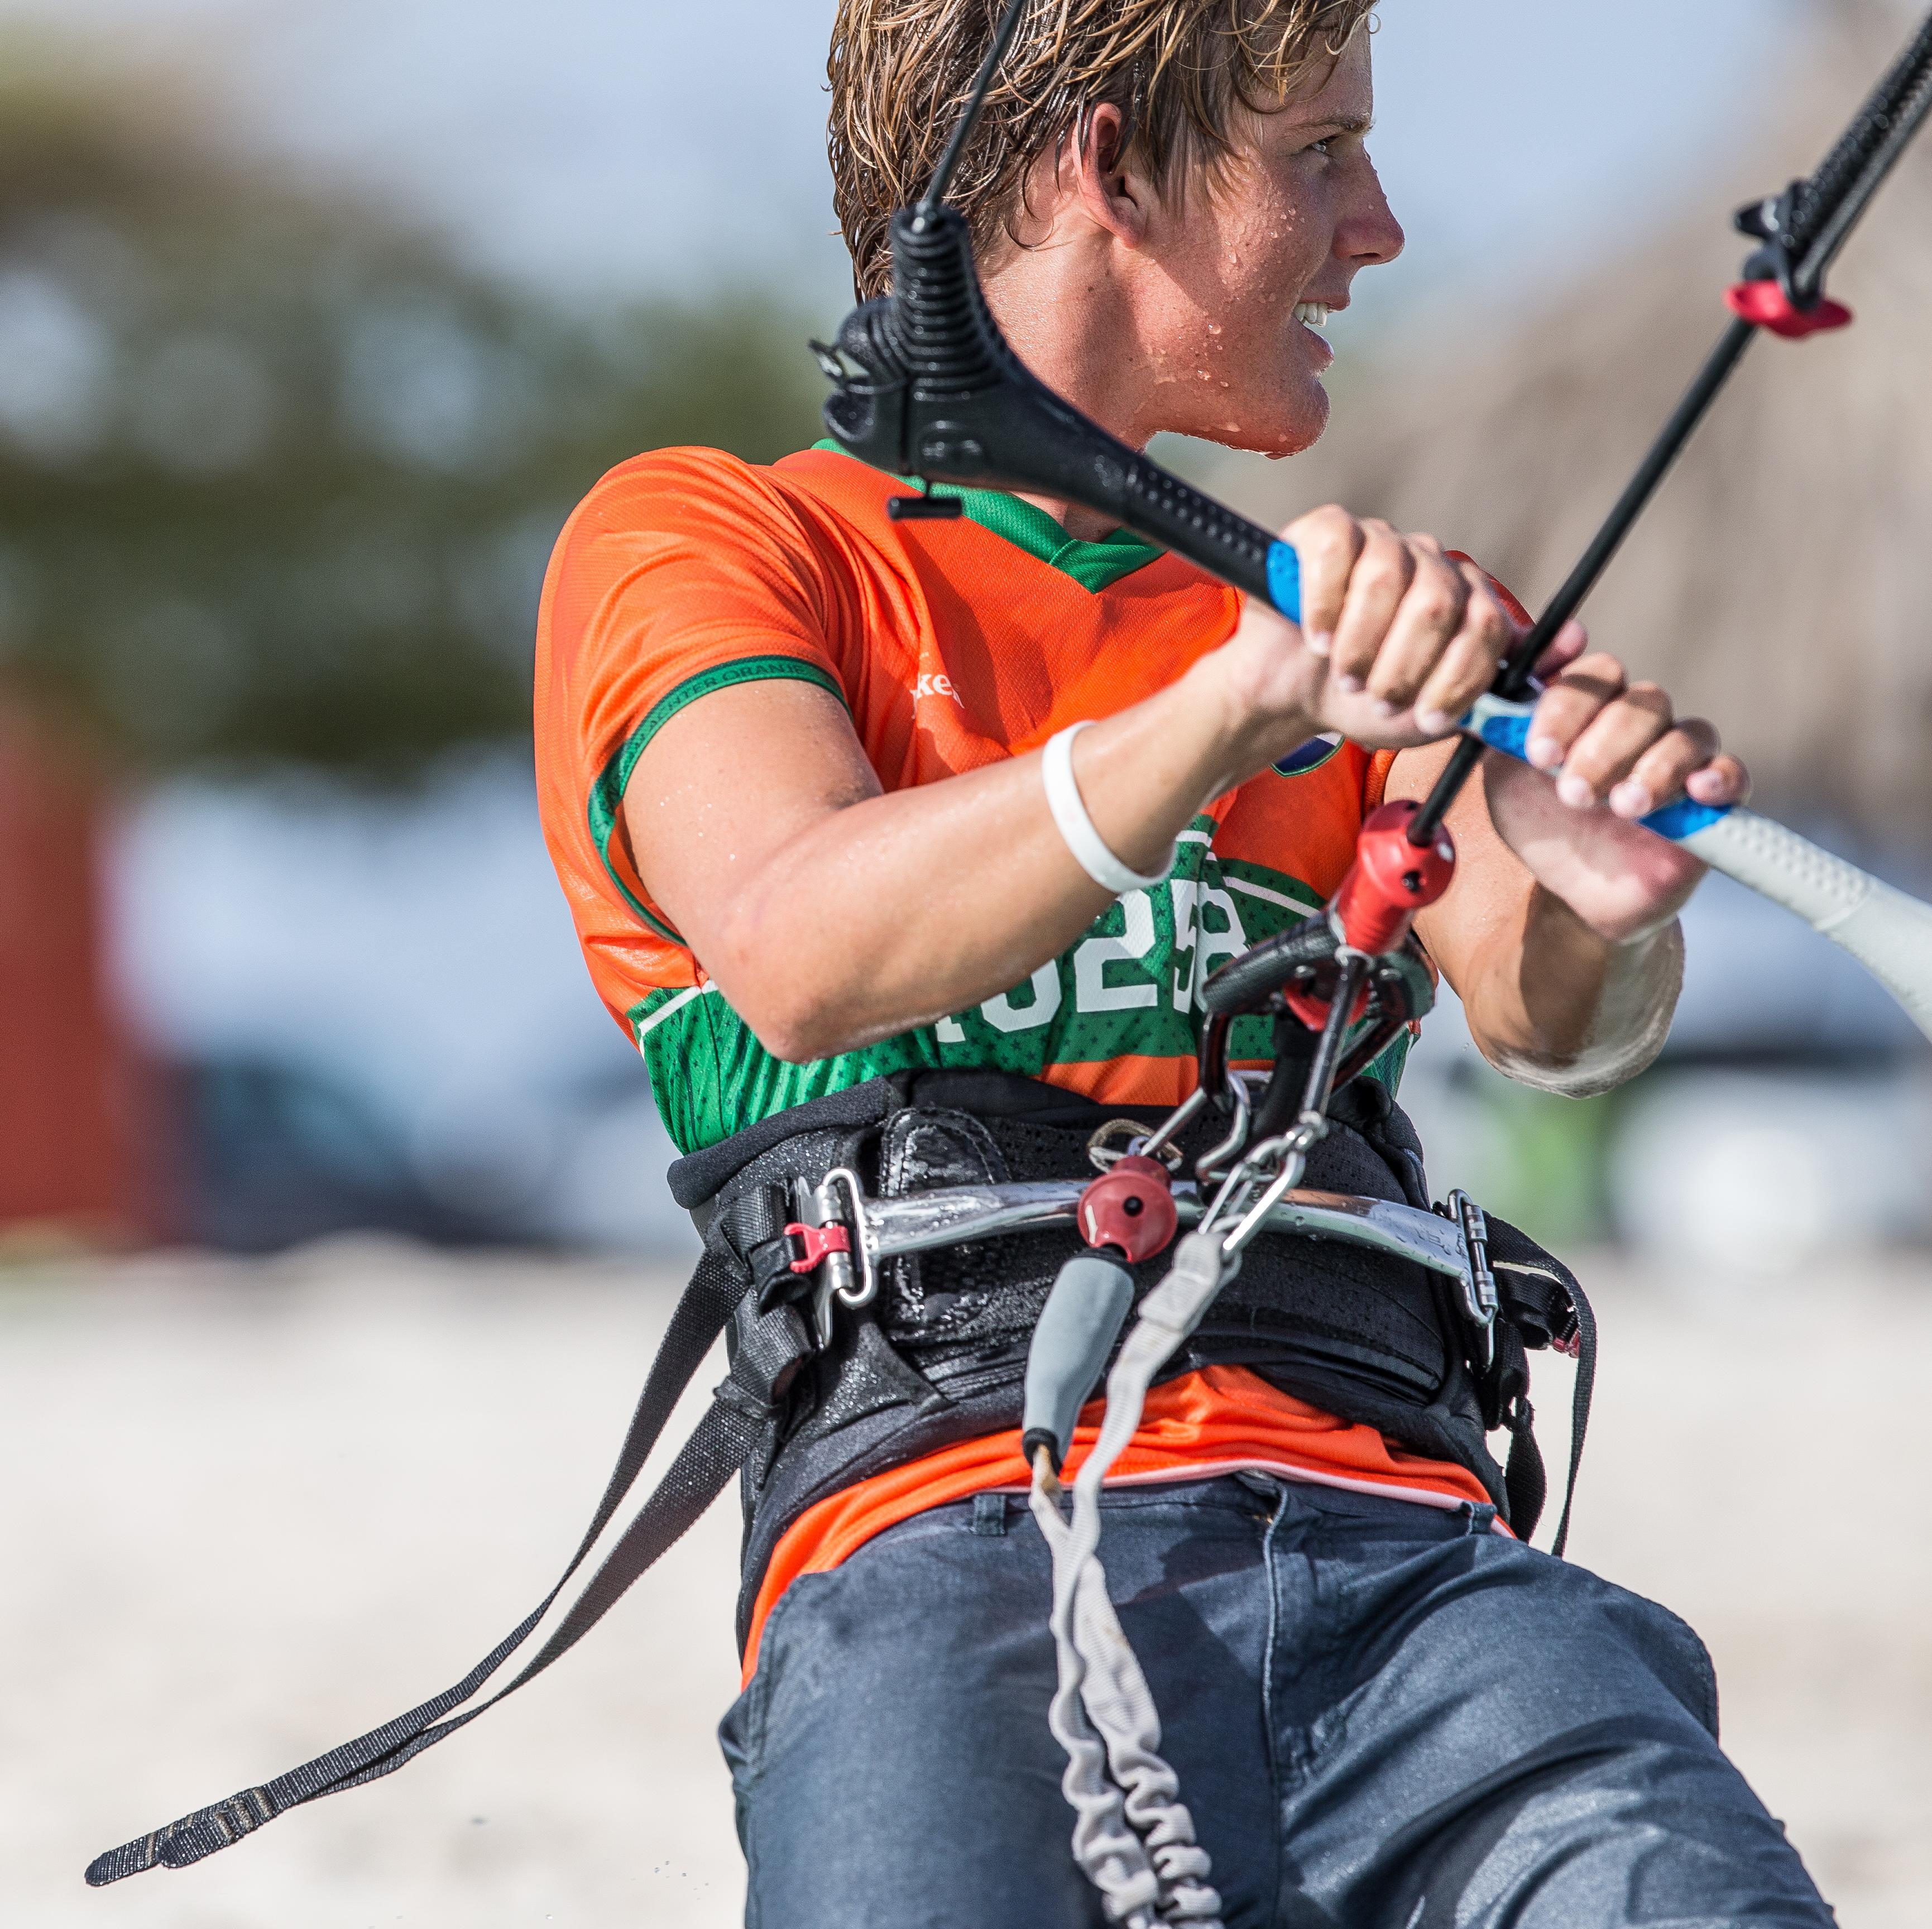 A73Q7396-1.jpg Kitesurfing Pictures